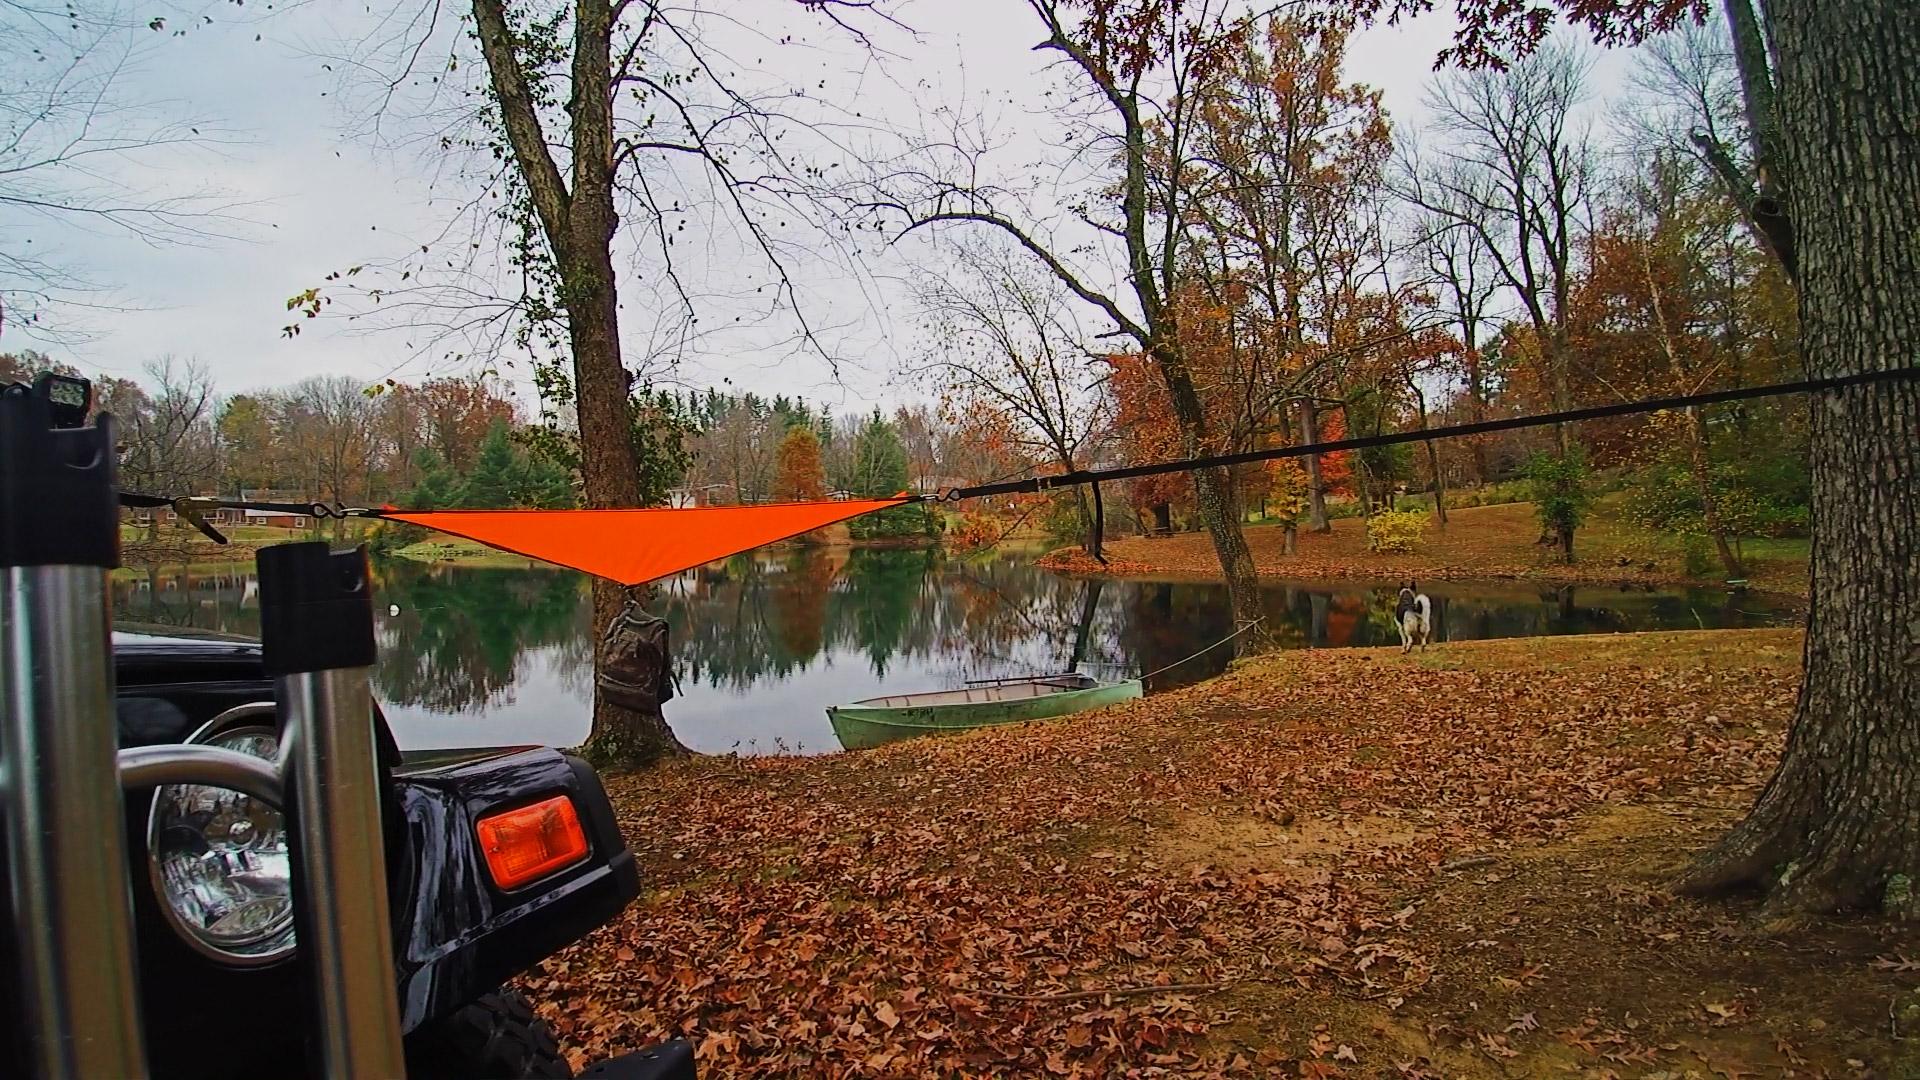 Orange 3-Point Hammock